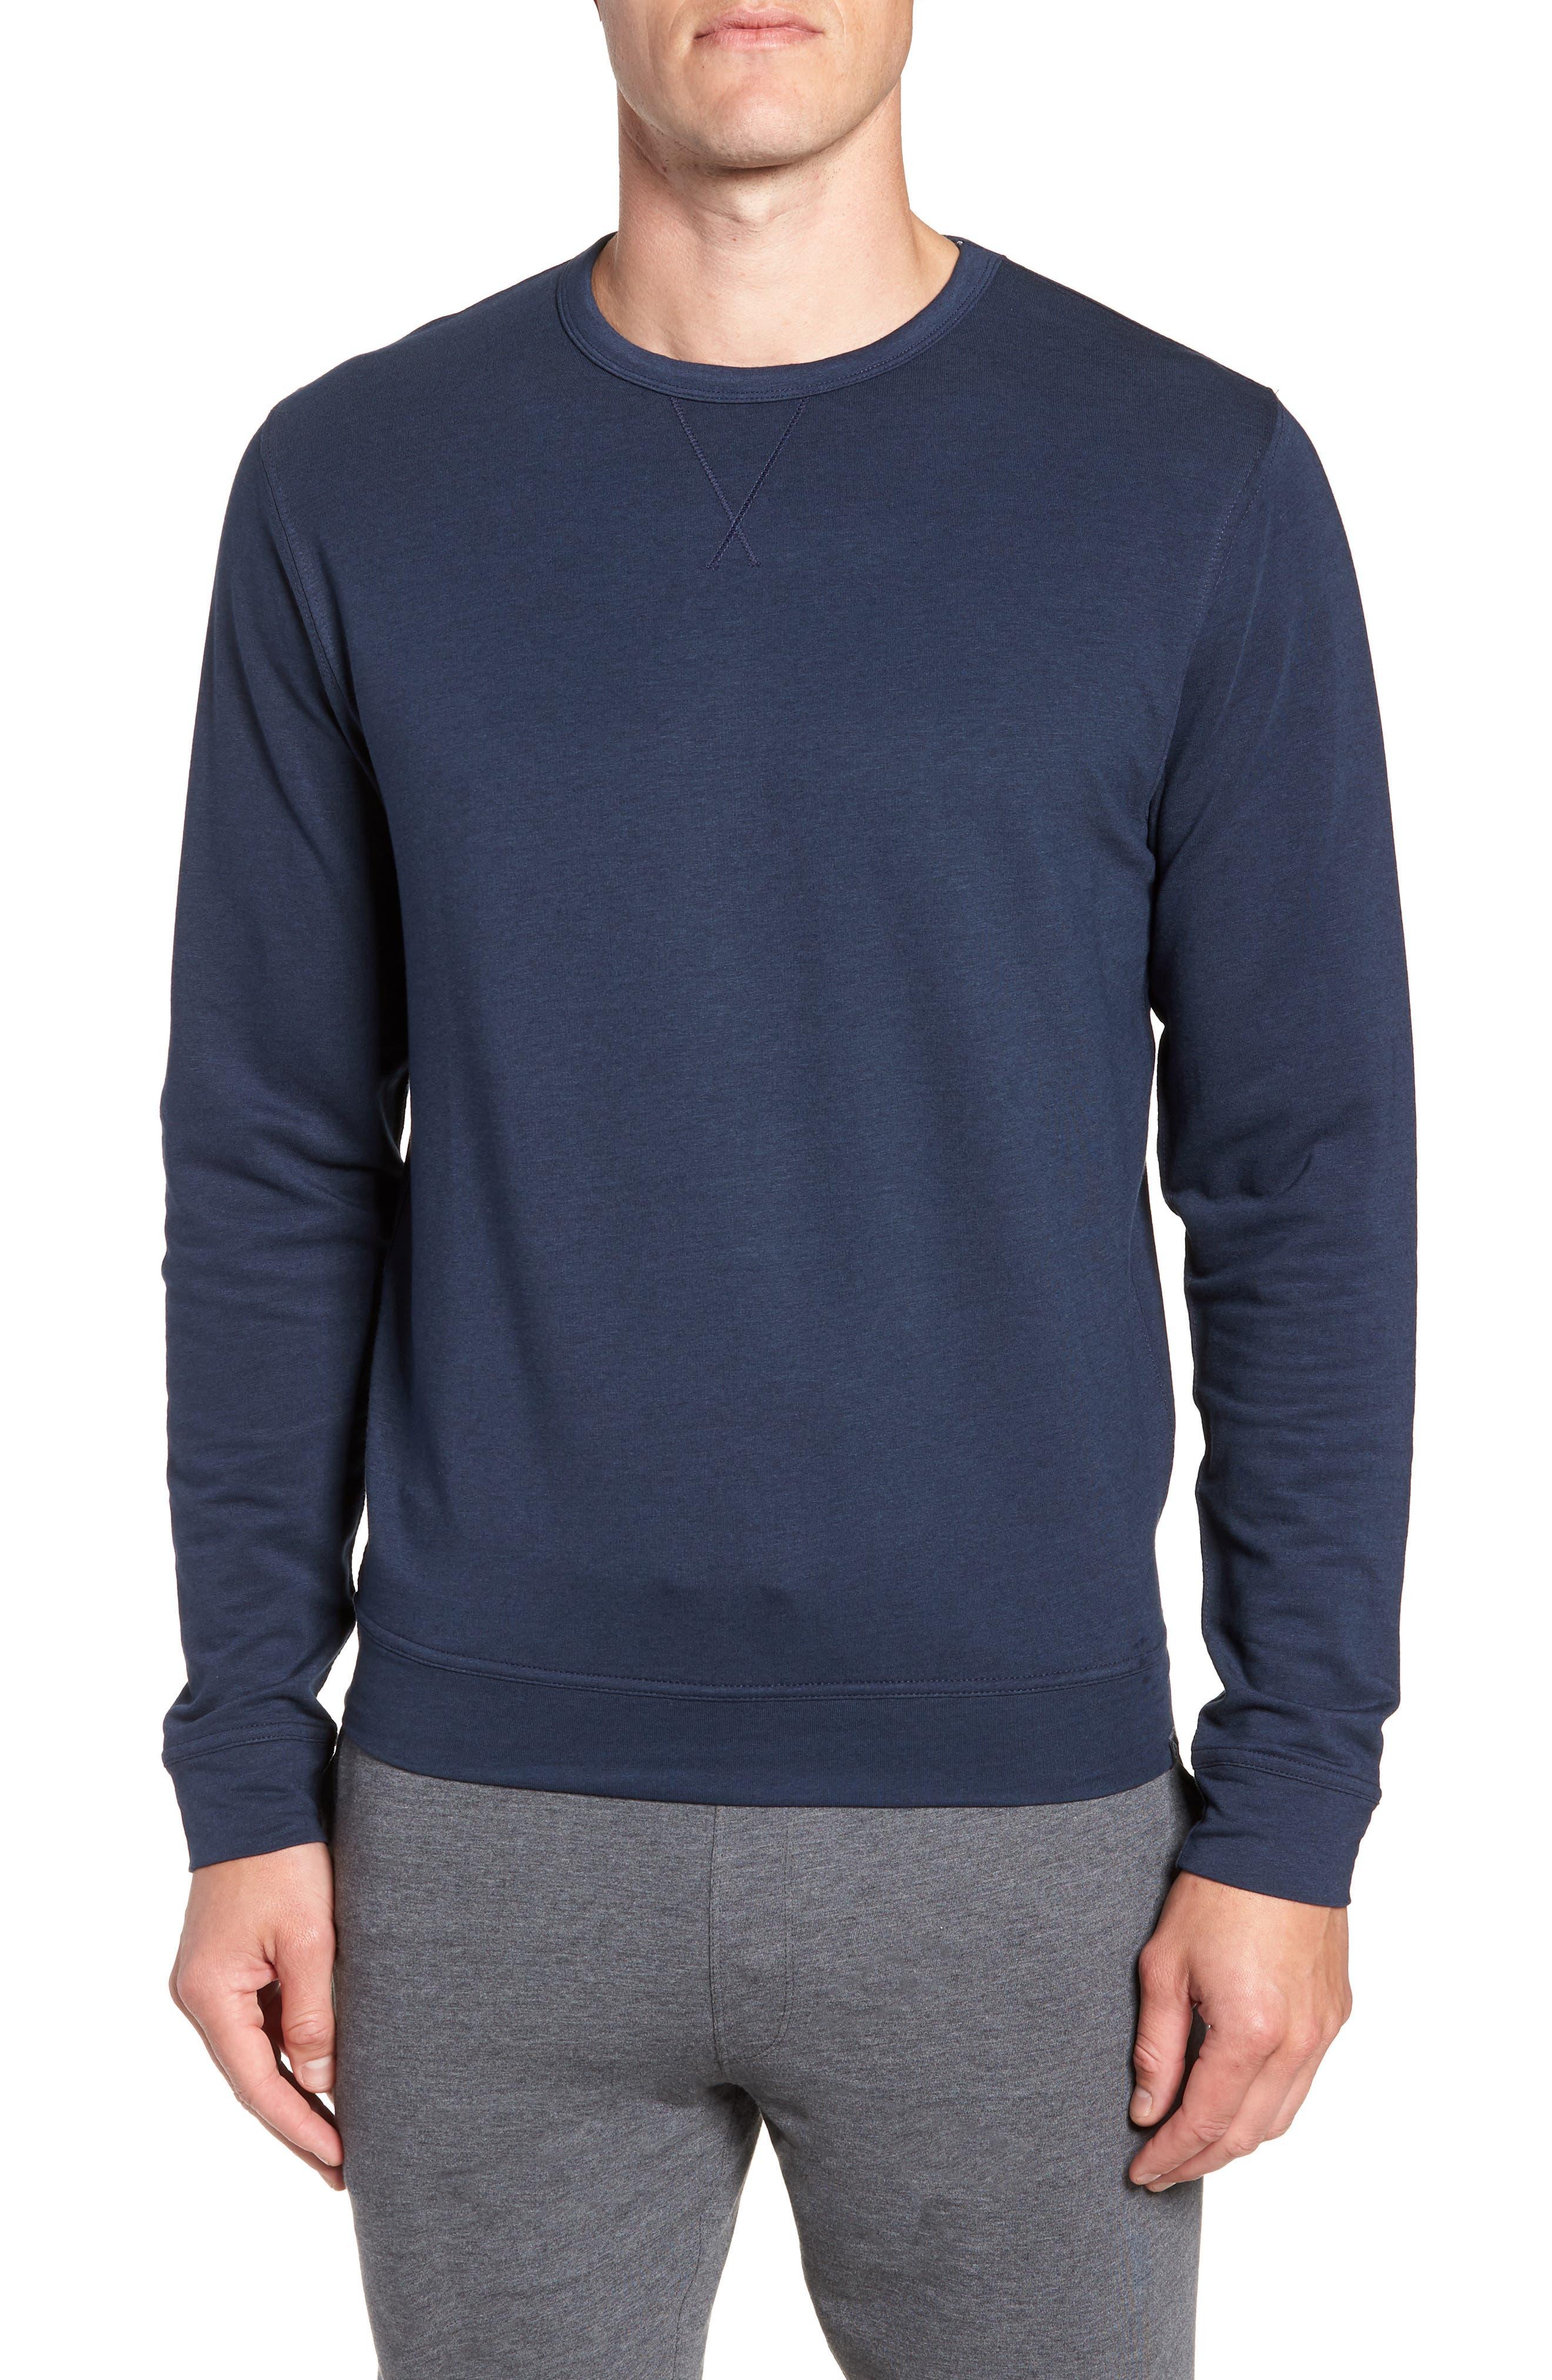 TASC PERFORMANCE Legacy Crewneck Semi Fitted Sweatshirt, Main, color, CLASSIC NAVY